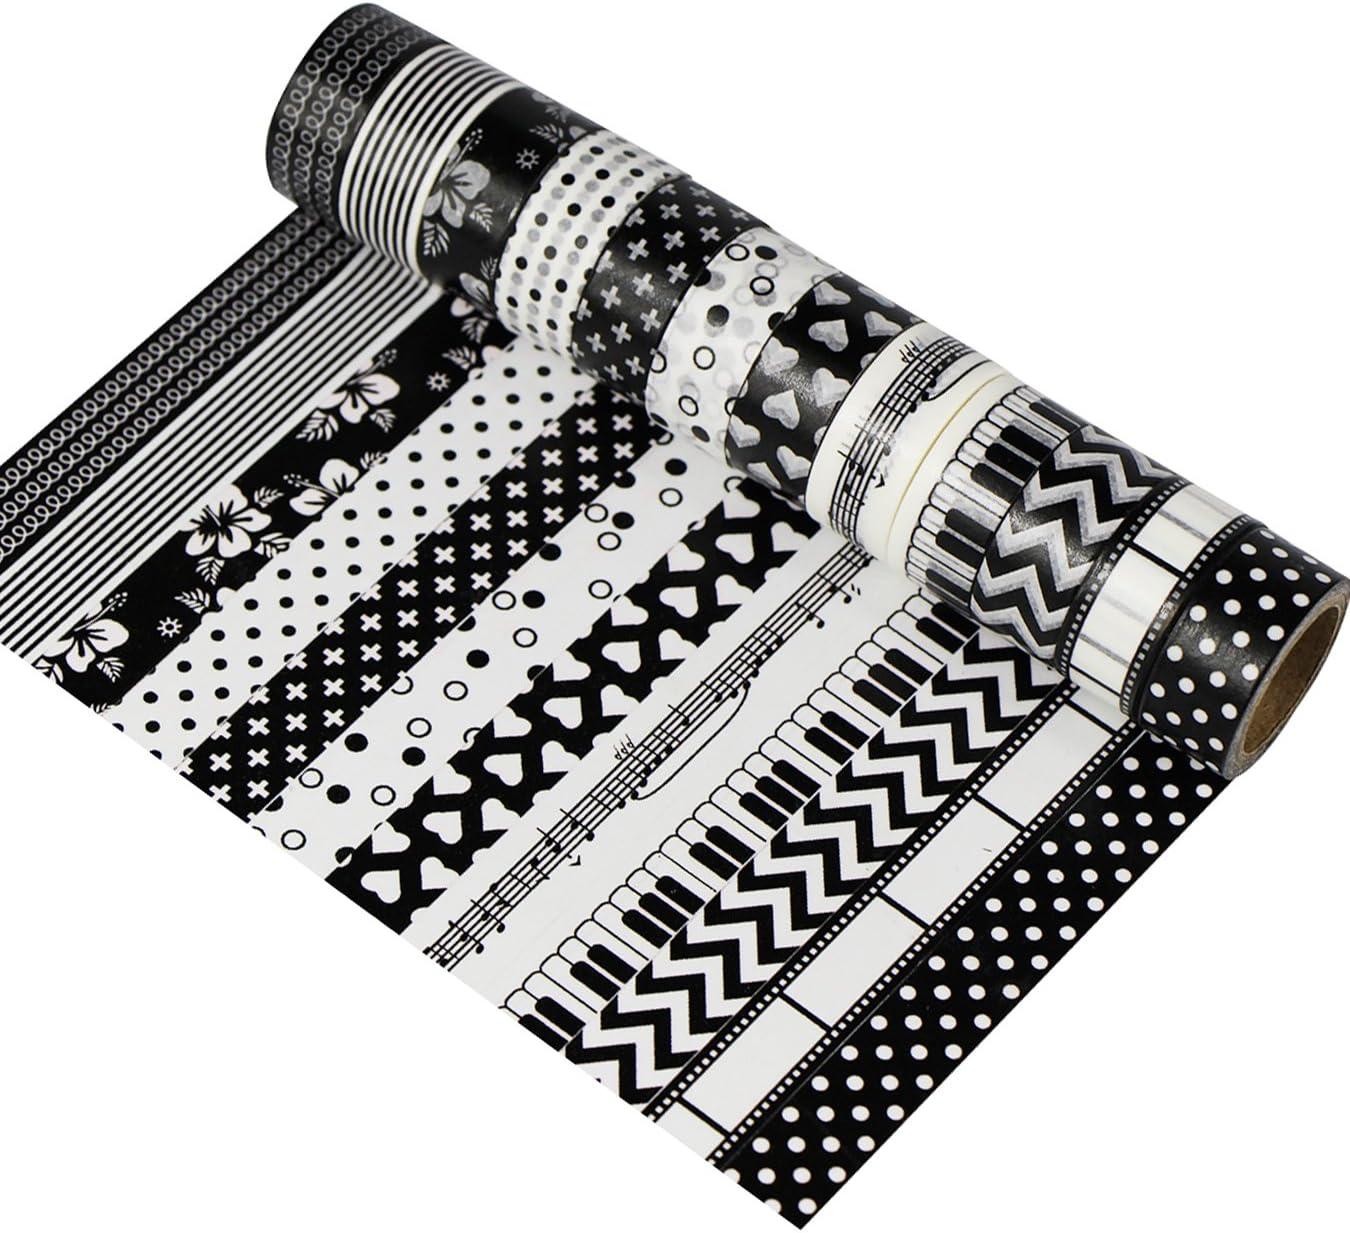 black UOOOM 12 Rotoli Decorativo Washi Tape Nastro Adesivo Scrapbooking DIY Craft regalo